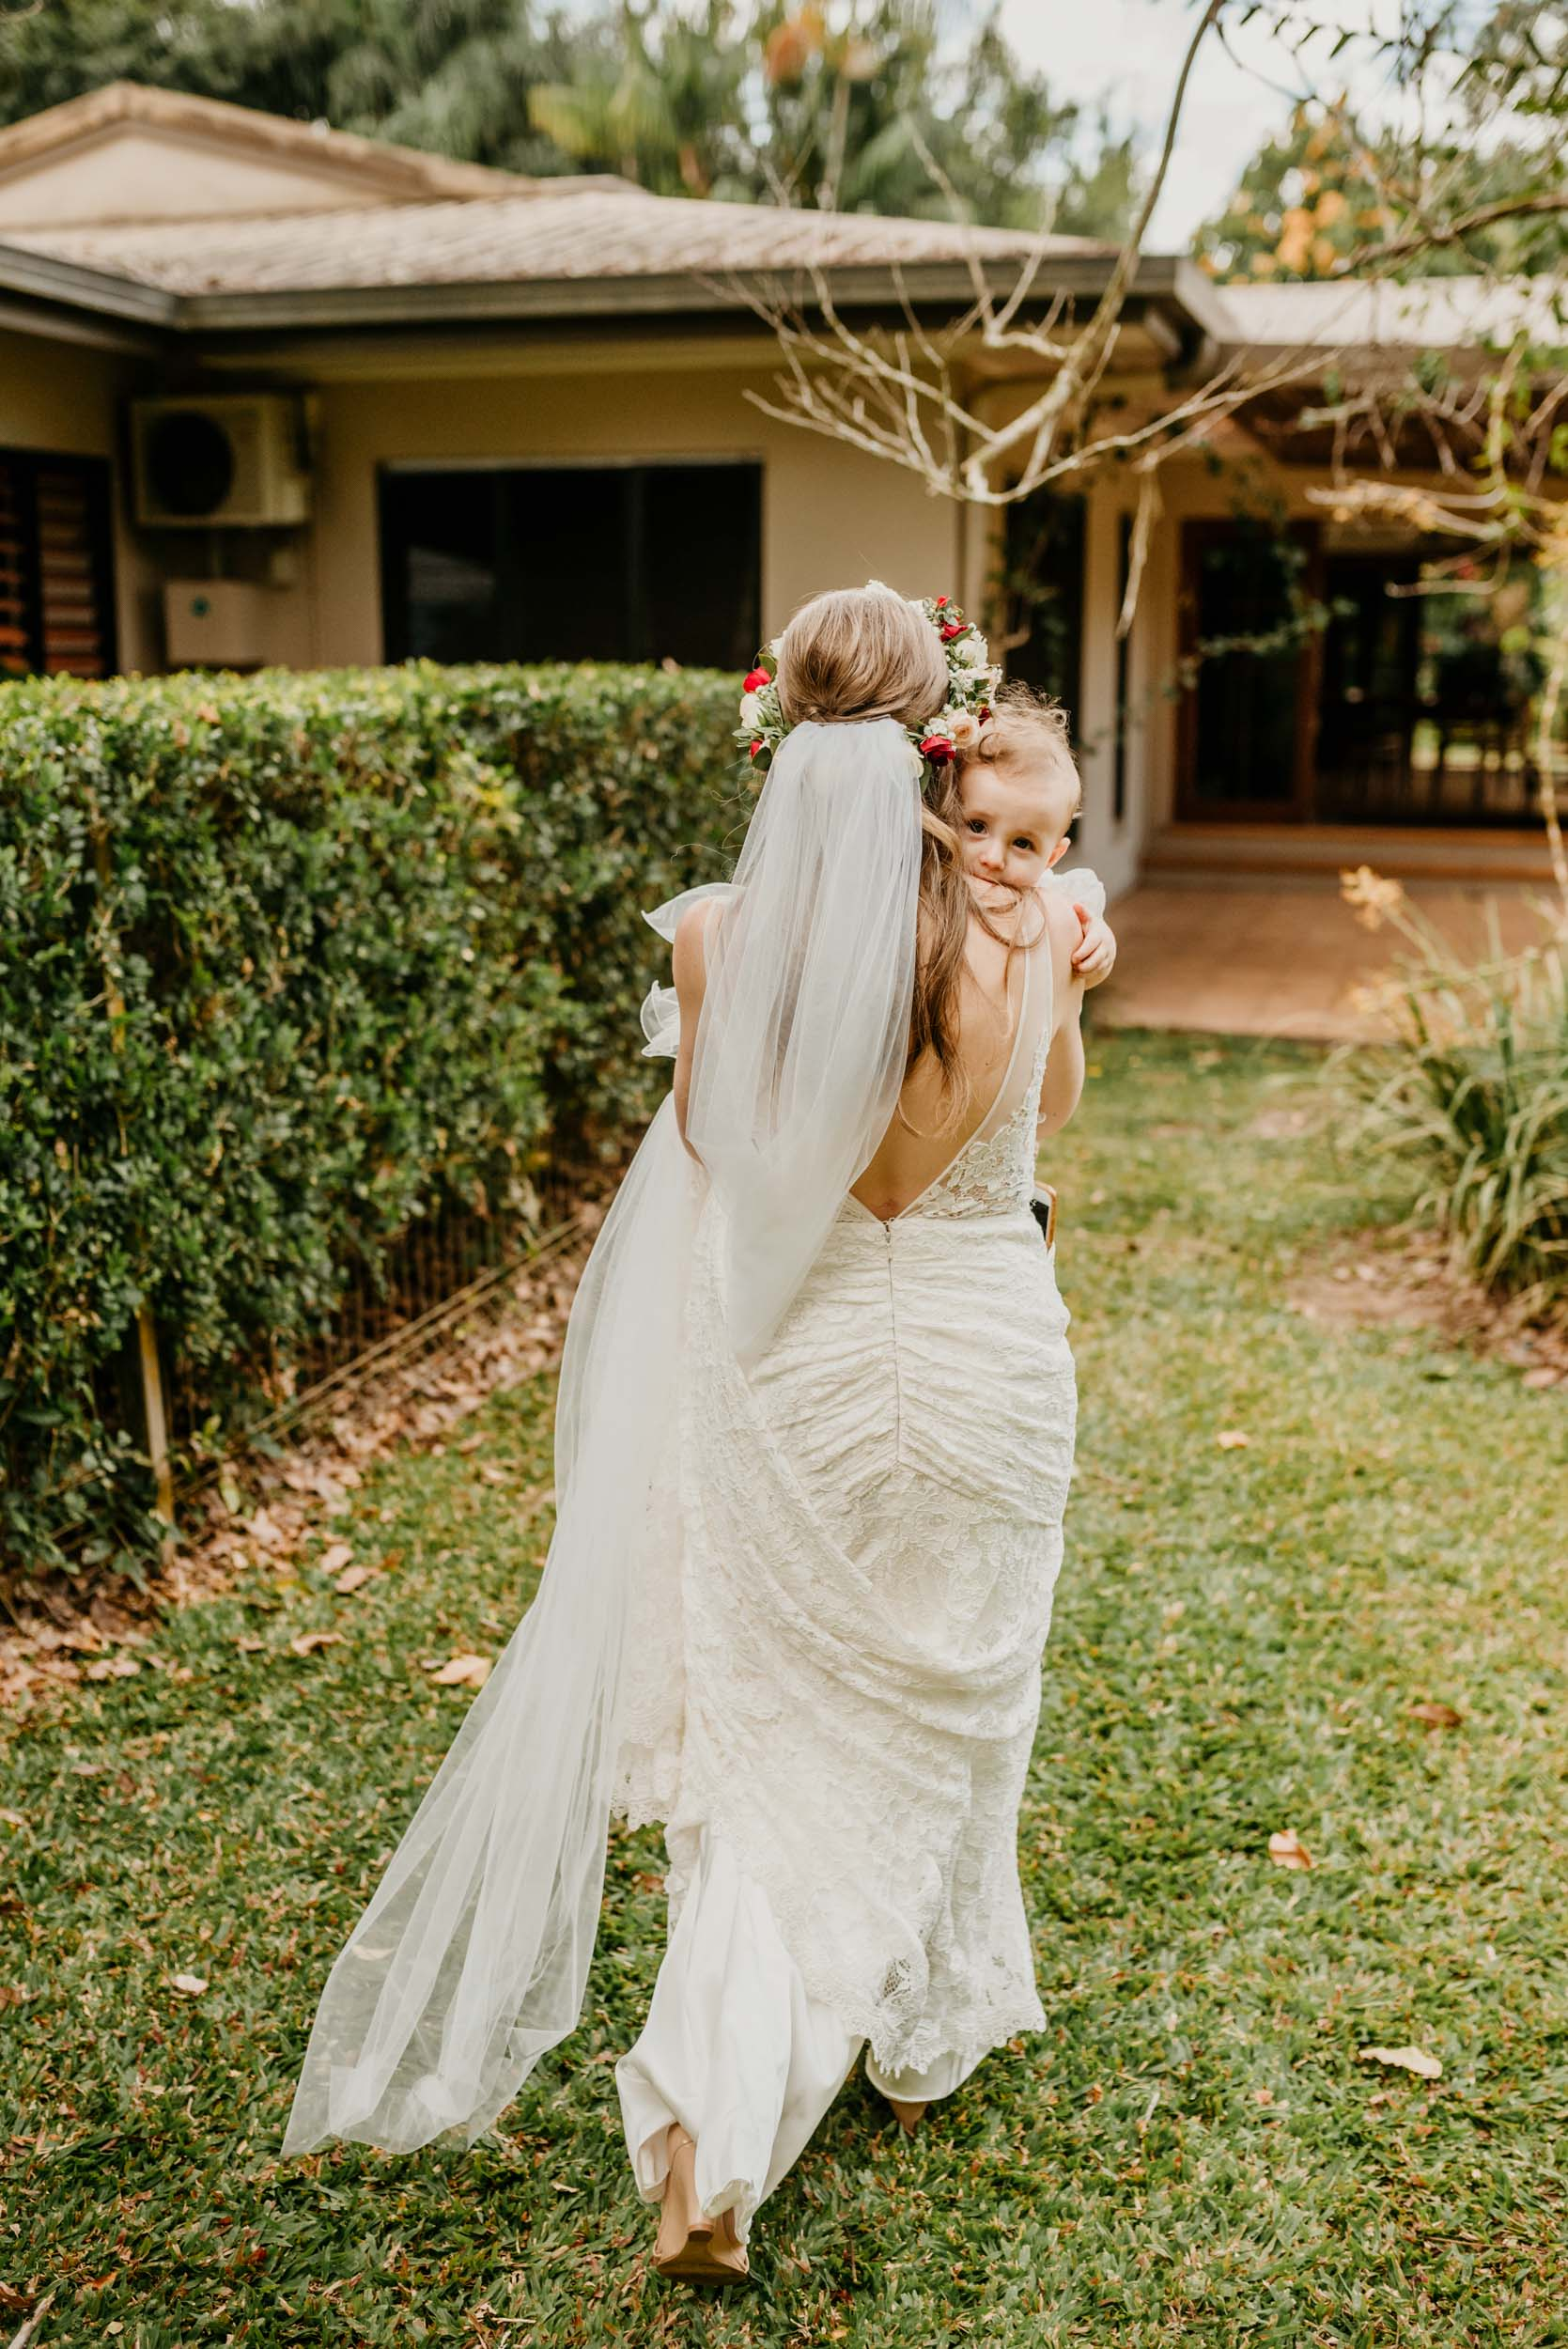 The Raw Photographer - Cairns Wedding Photographer - Laloli - Cairns Garden Ceremony - Cane Fields Photo Shoot-20.jpg